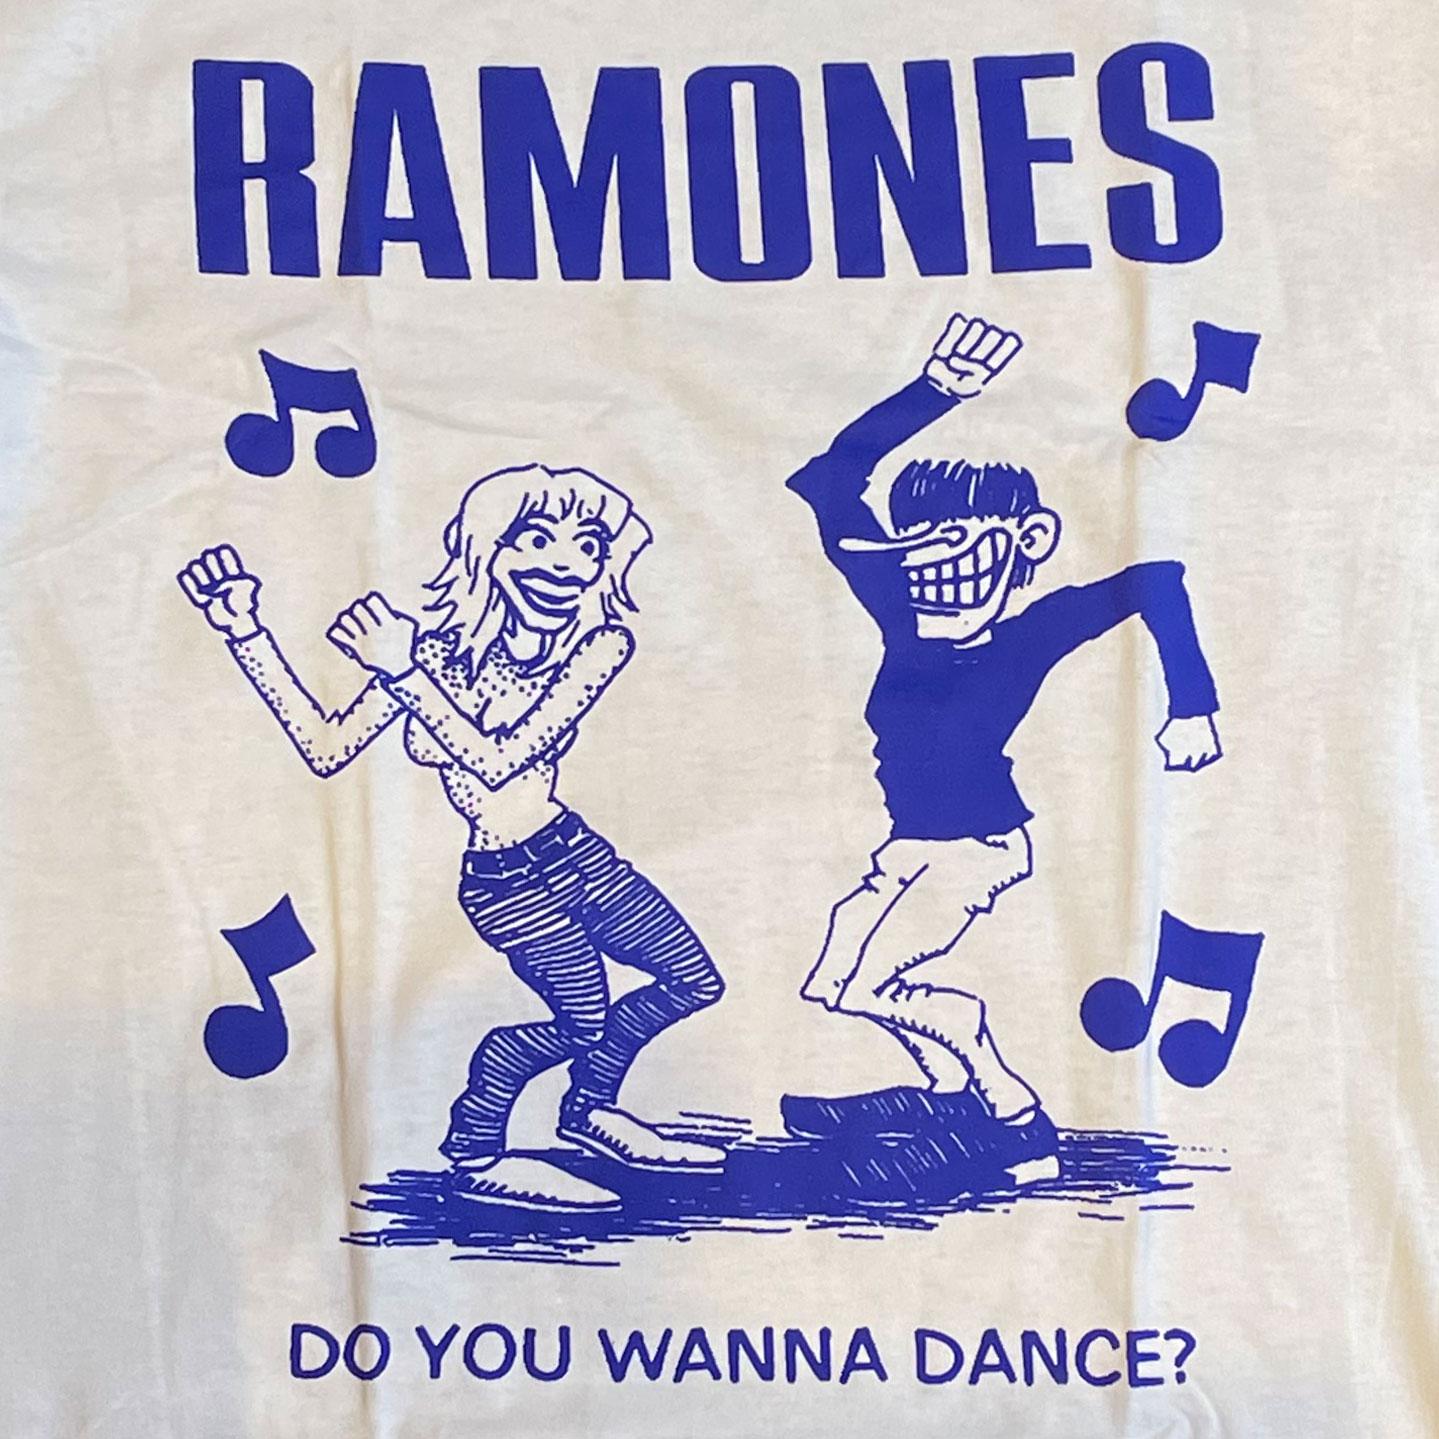 RAMONES Tシャツ DO YOU WANNADANCE?